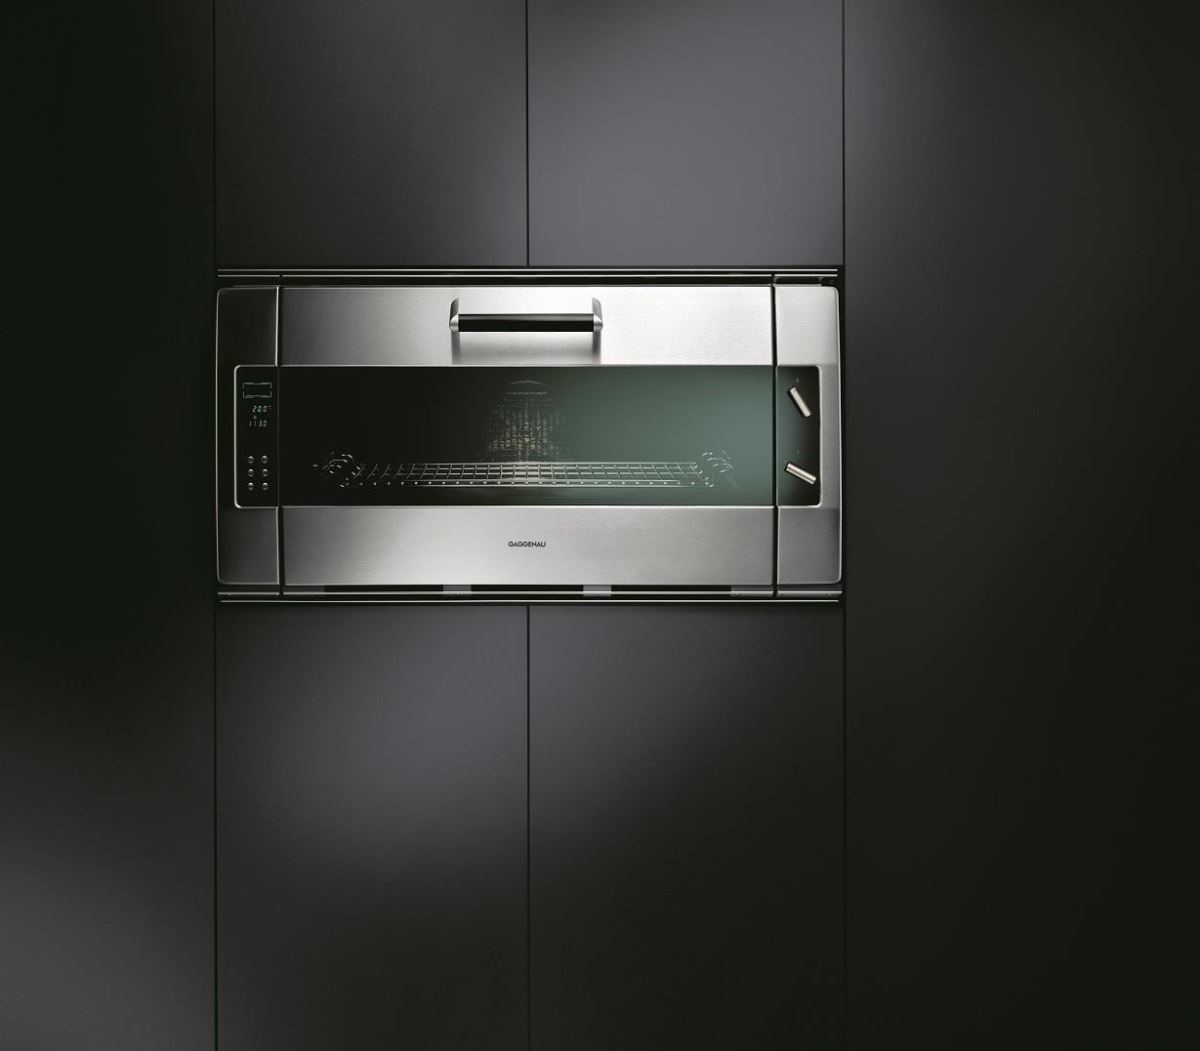 Gaggenau EB388經典烤箱以手工打造,寬達90公分的巨大空間,能處理大份量的食材,備有爐內探針,準確掌握調理溫度。烤箱內更配製電轉烤肉架、烘焙石和高溫分解自清系統。